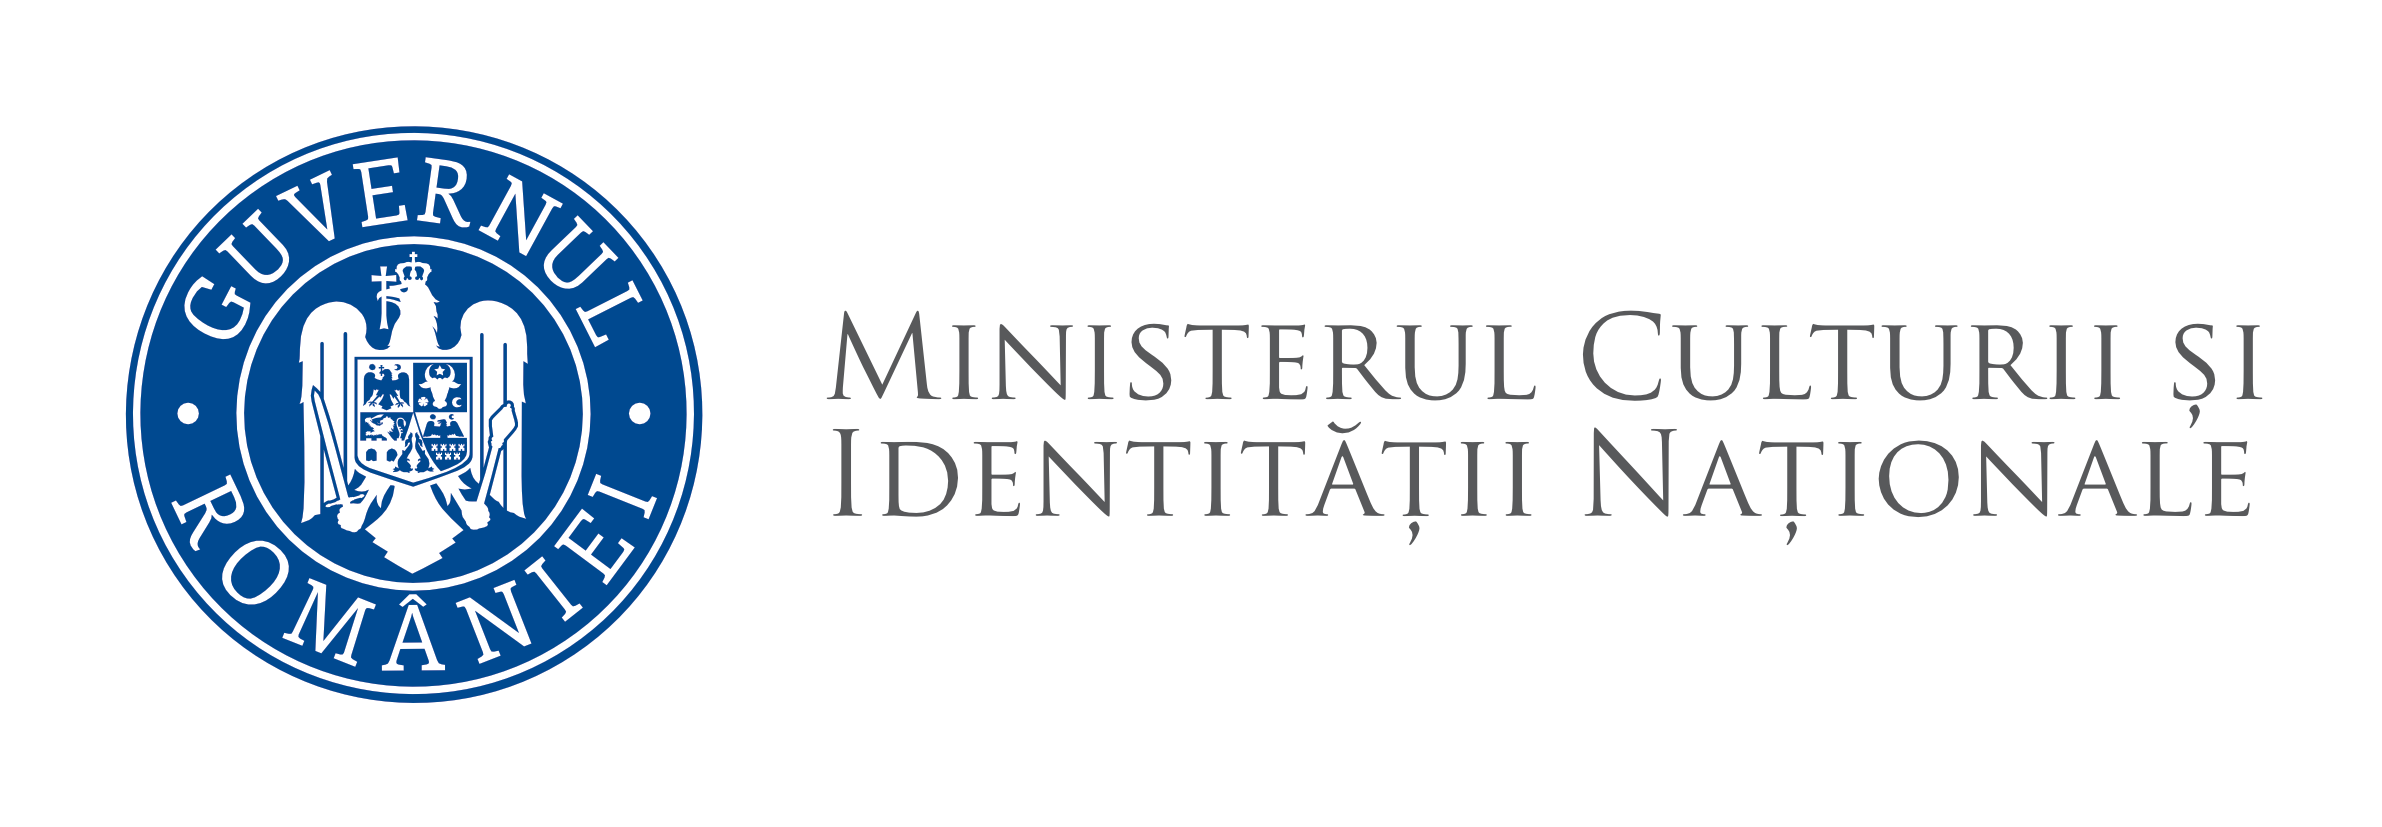 Logo-MCIN (1).png